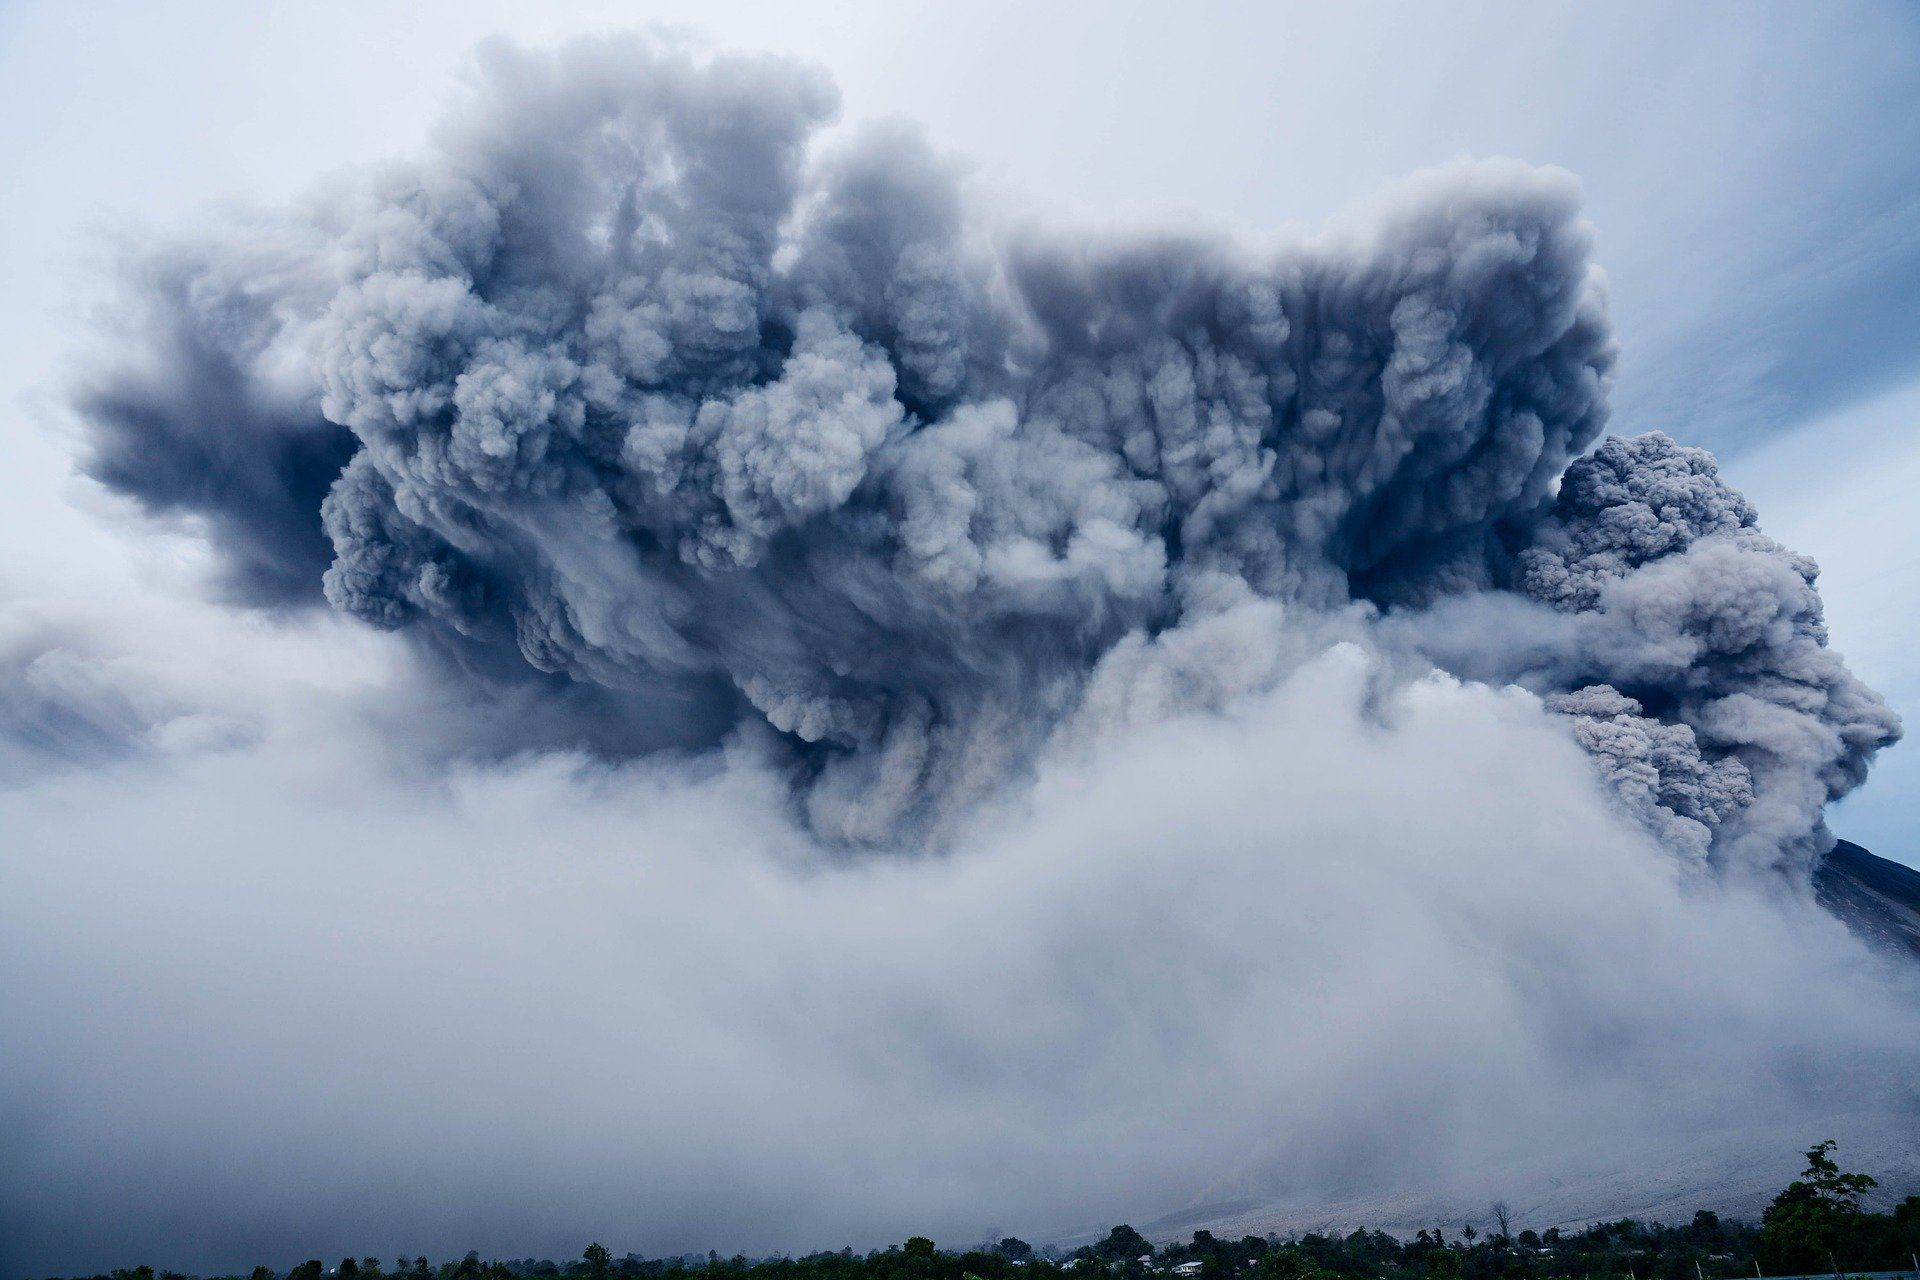 Vulkanausbruch: Zahl der Todesopfer steigt